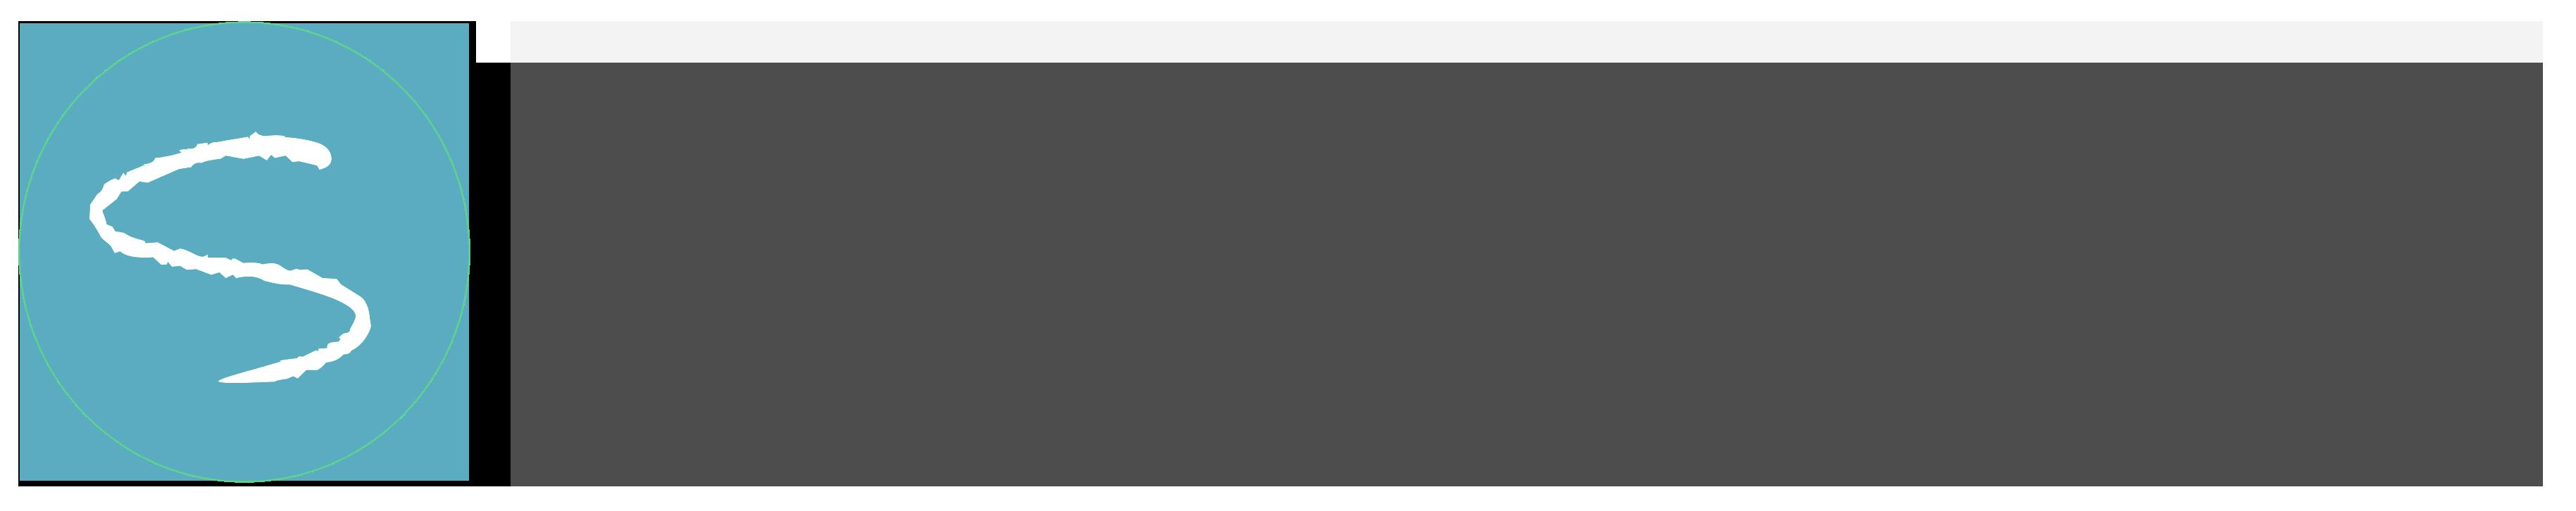 Site Inside